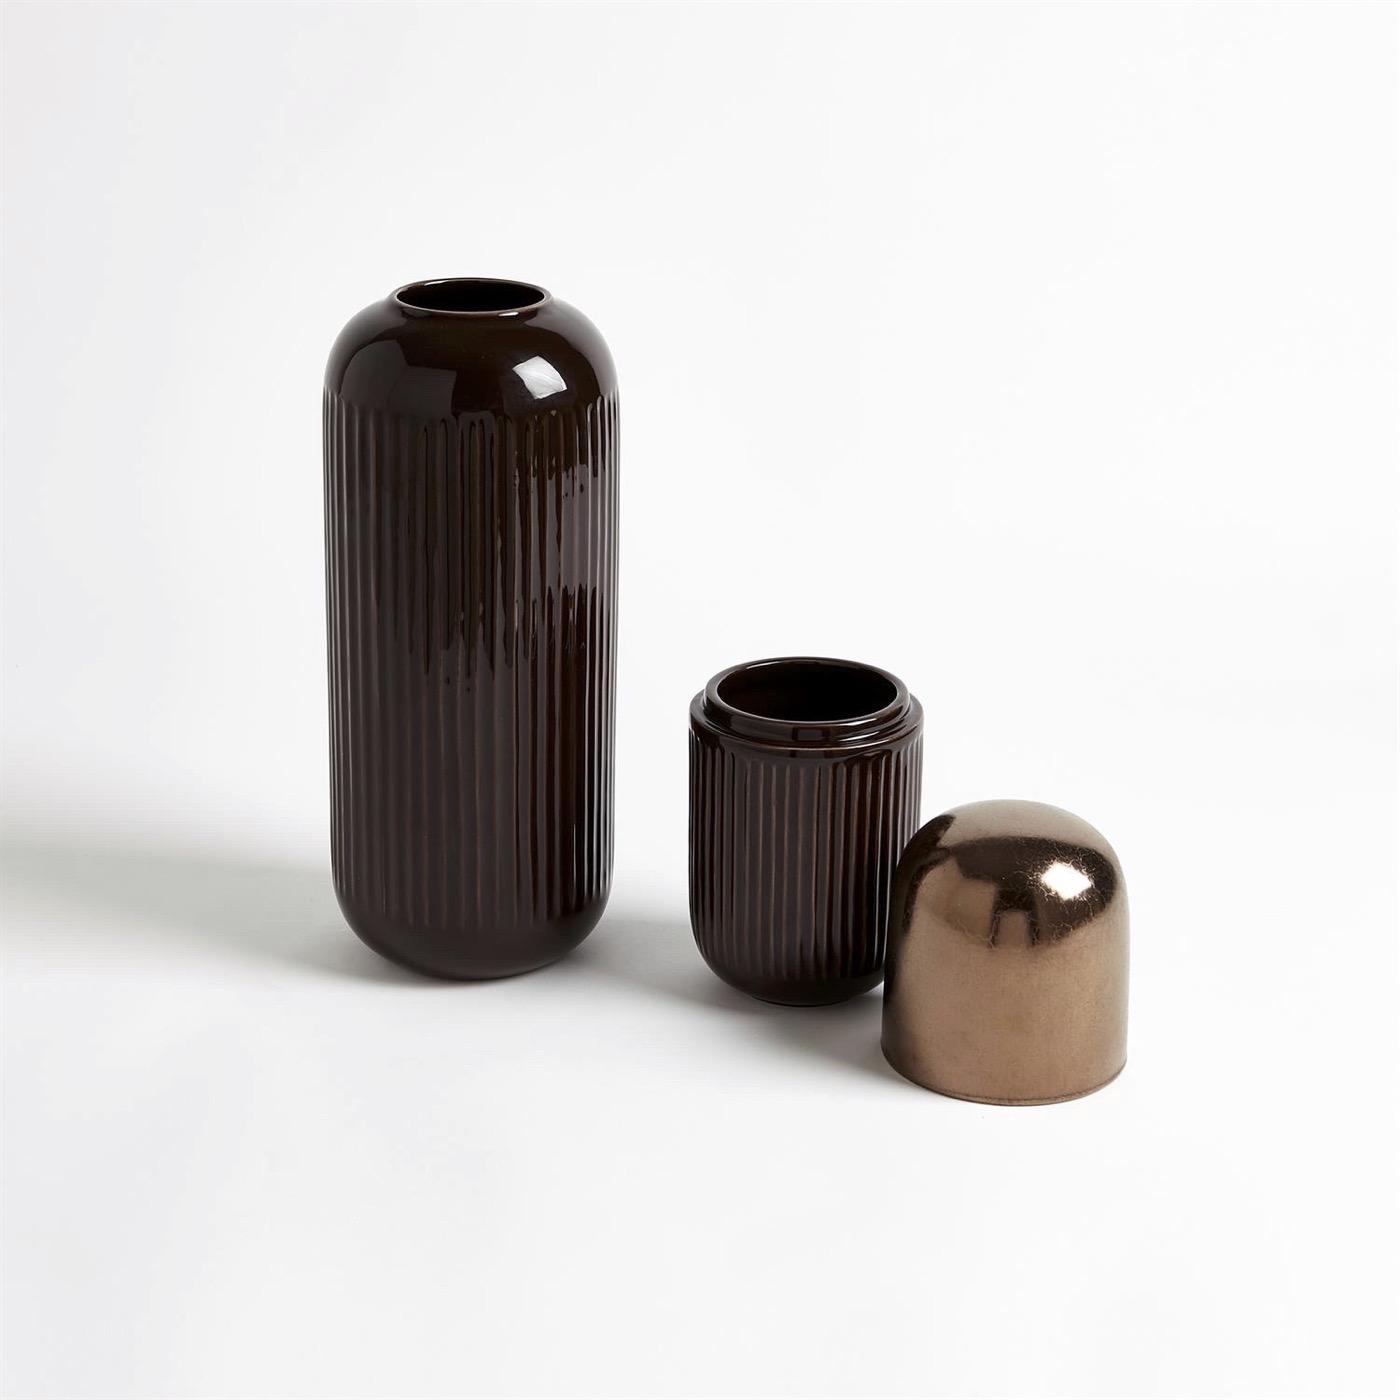 Medici Lidded Ceramic Jar